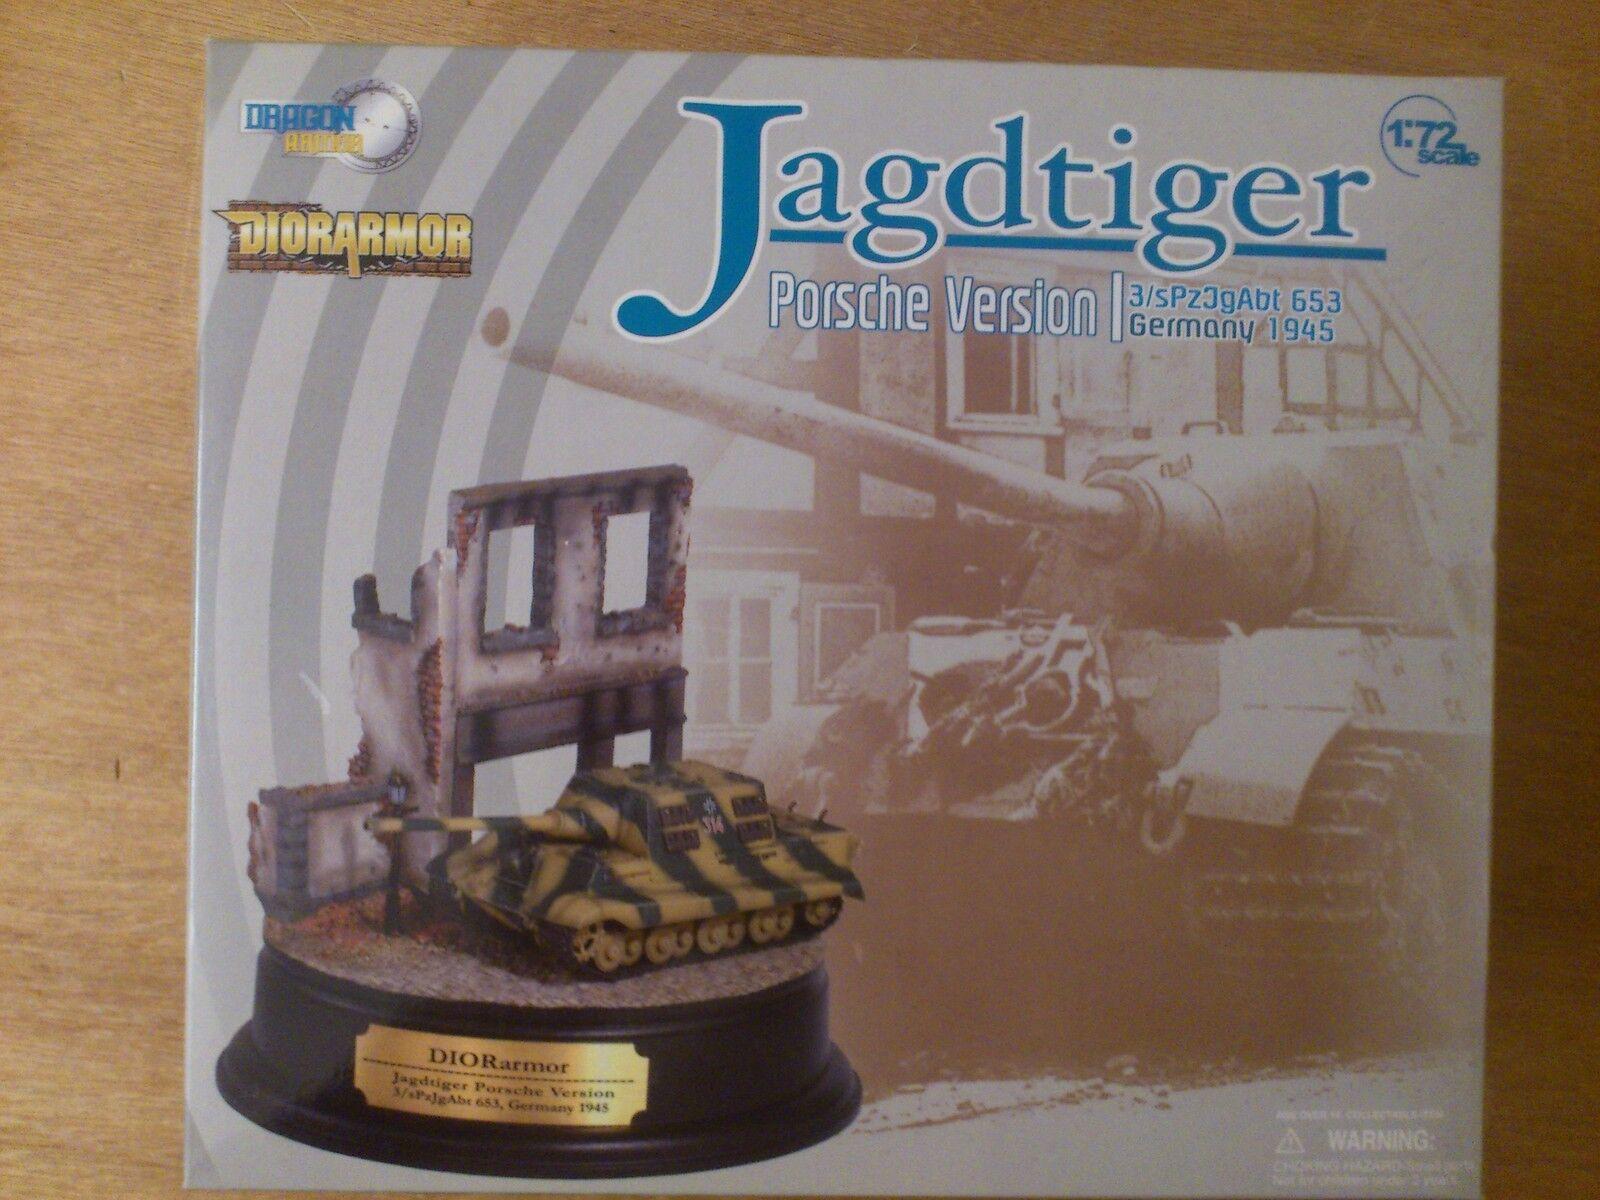 1 72 drachen 60201 tigre caza porsche version 3   spzjgabt 653 germany1945